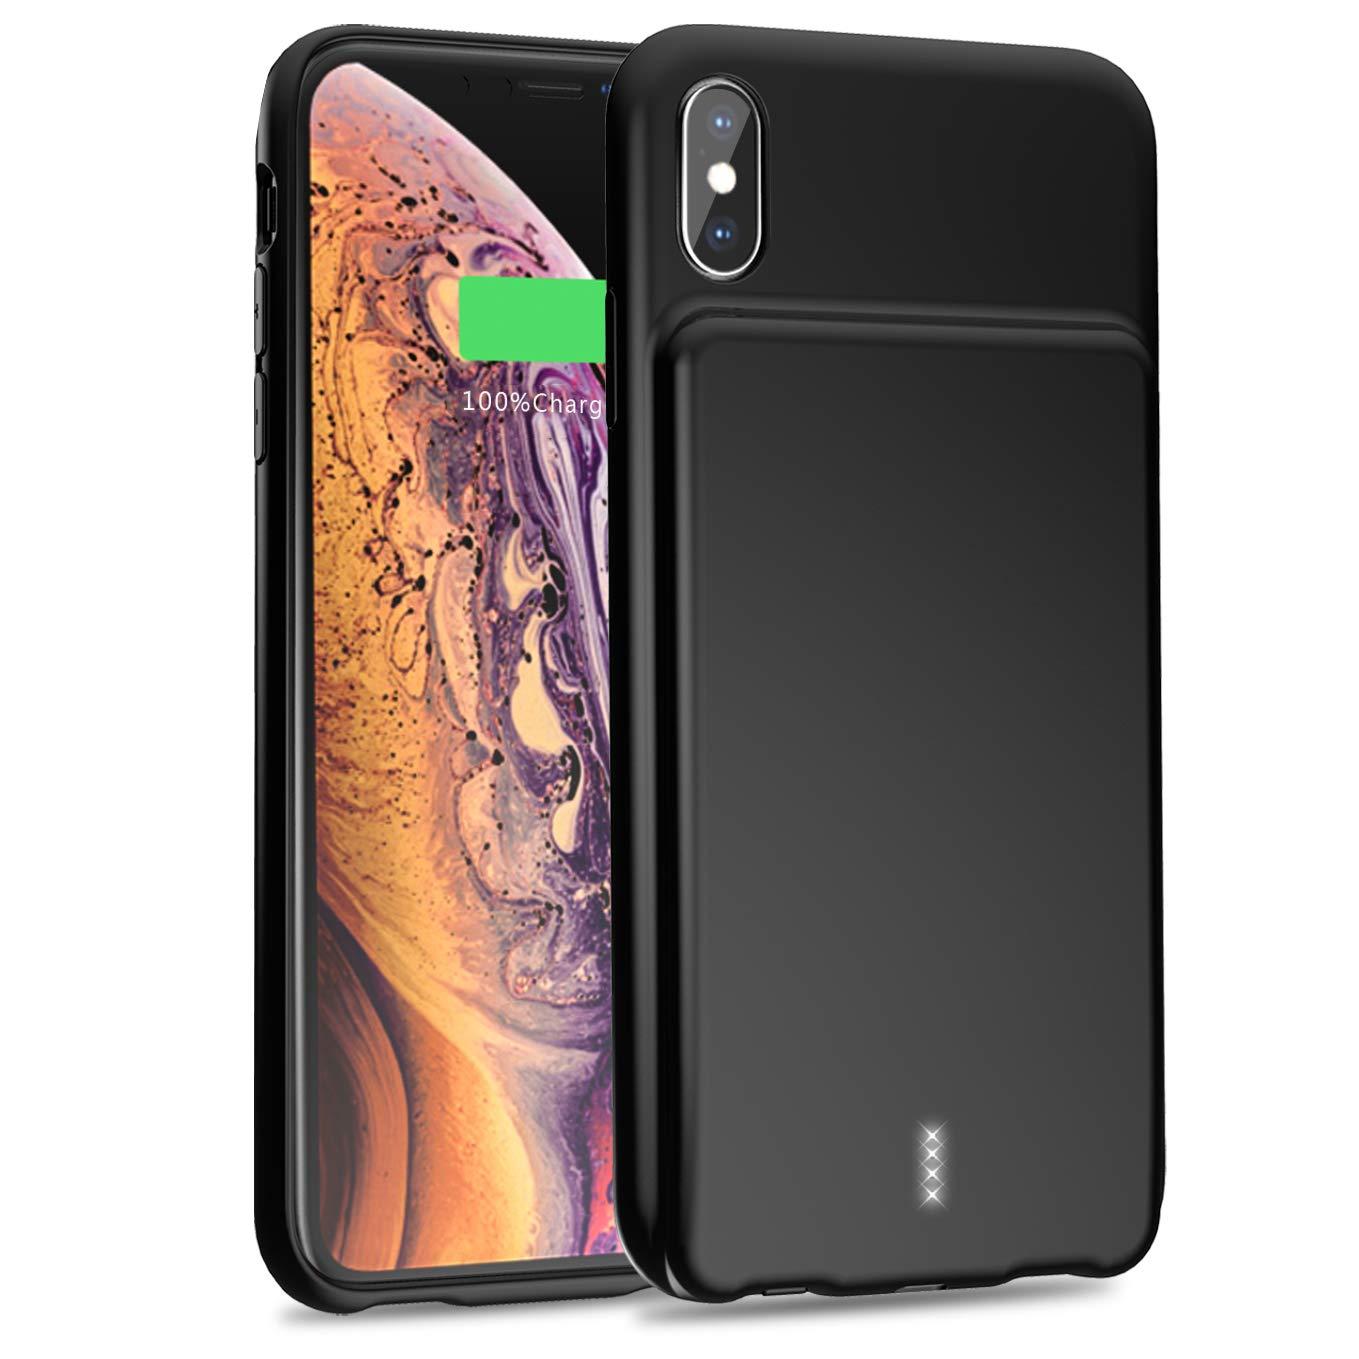 Funda Con Bateria de 5000mah para Apple Iphone Xs Max YISHDA [7LCJ8Q62]